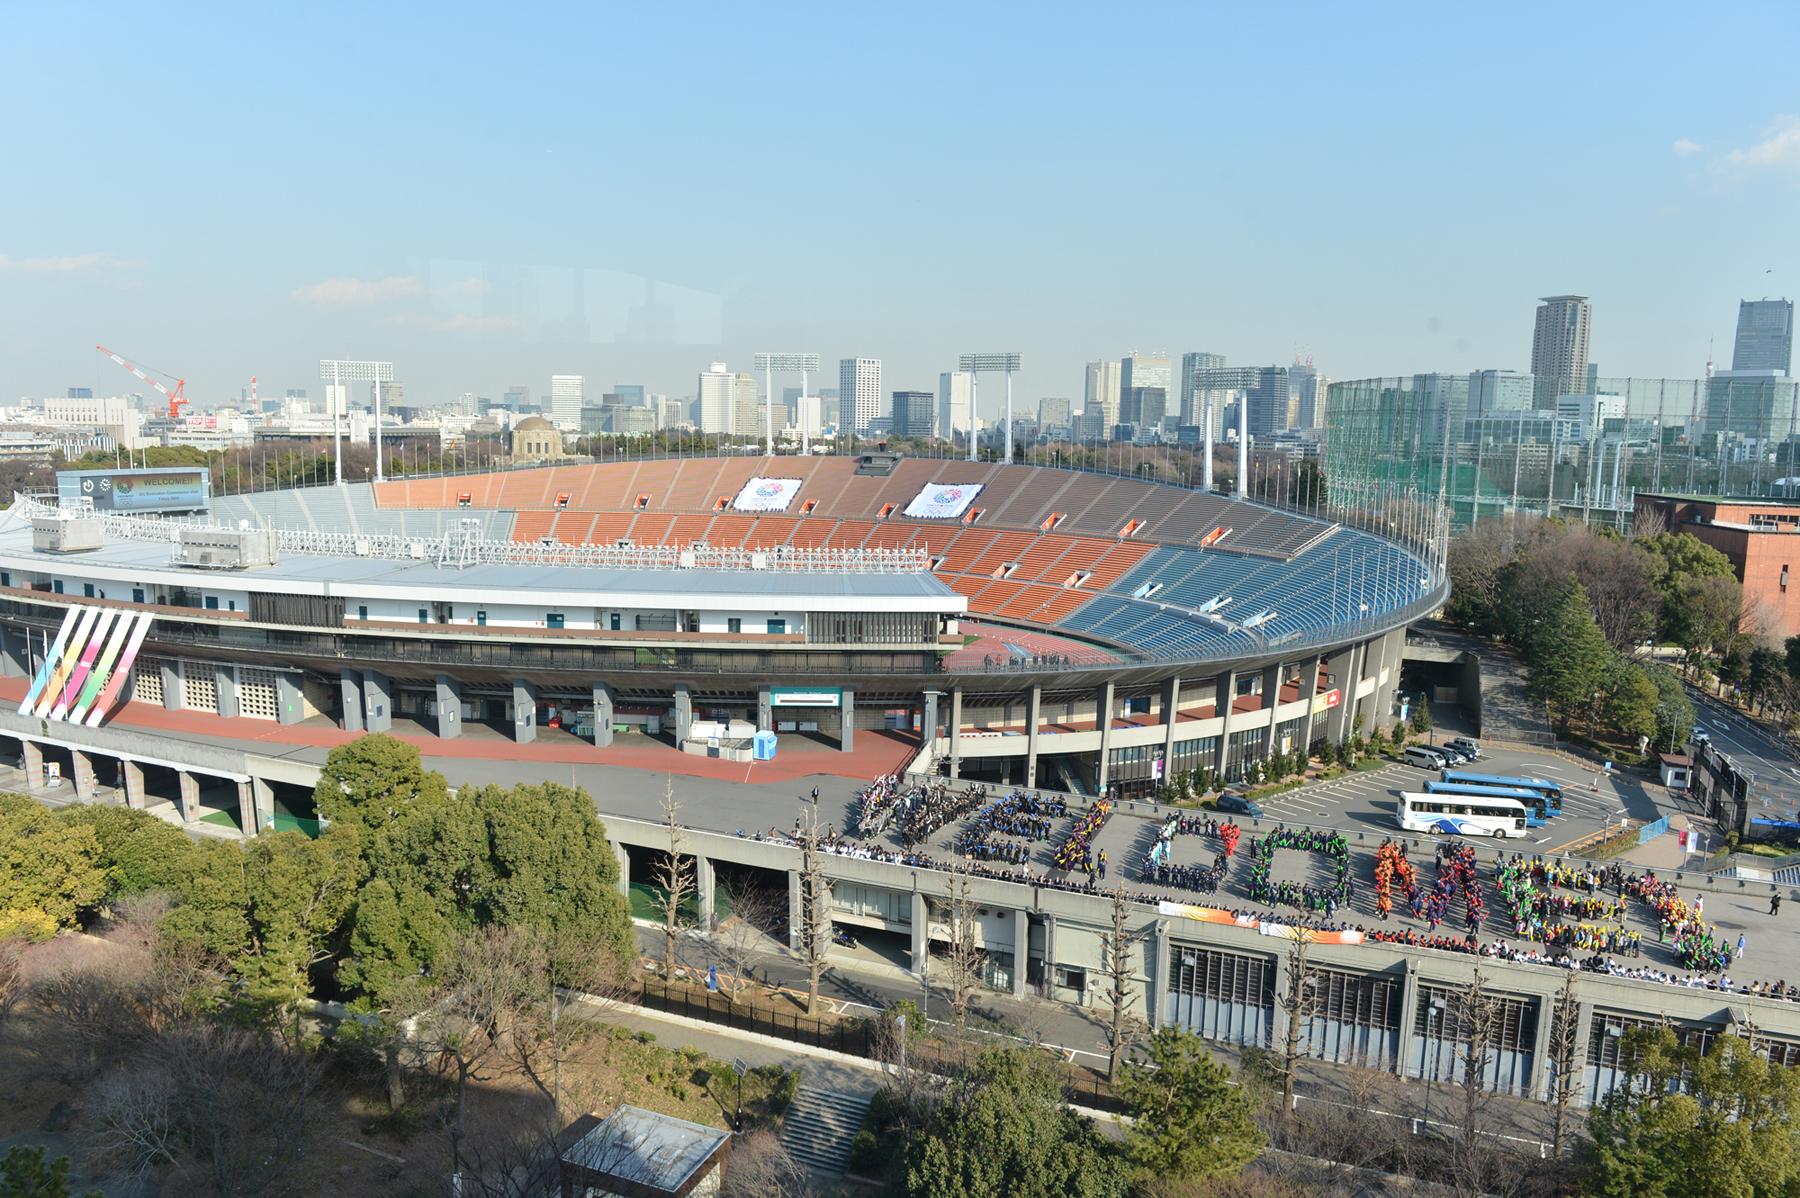 photo courtesy Tokyo 2020